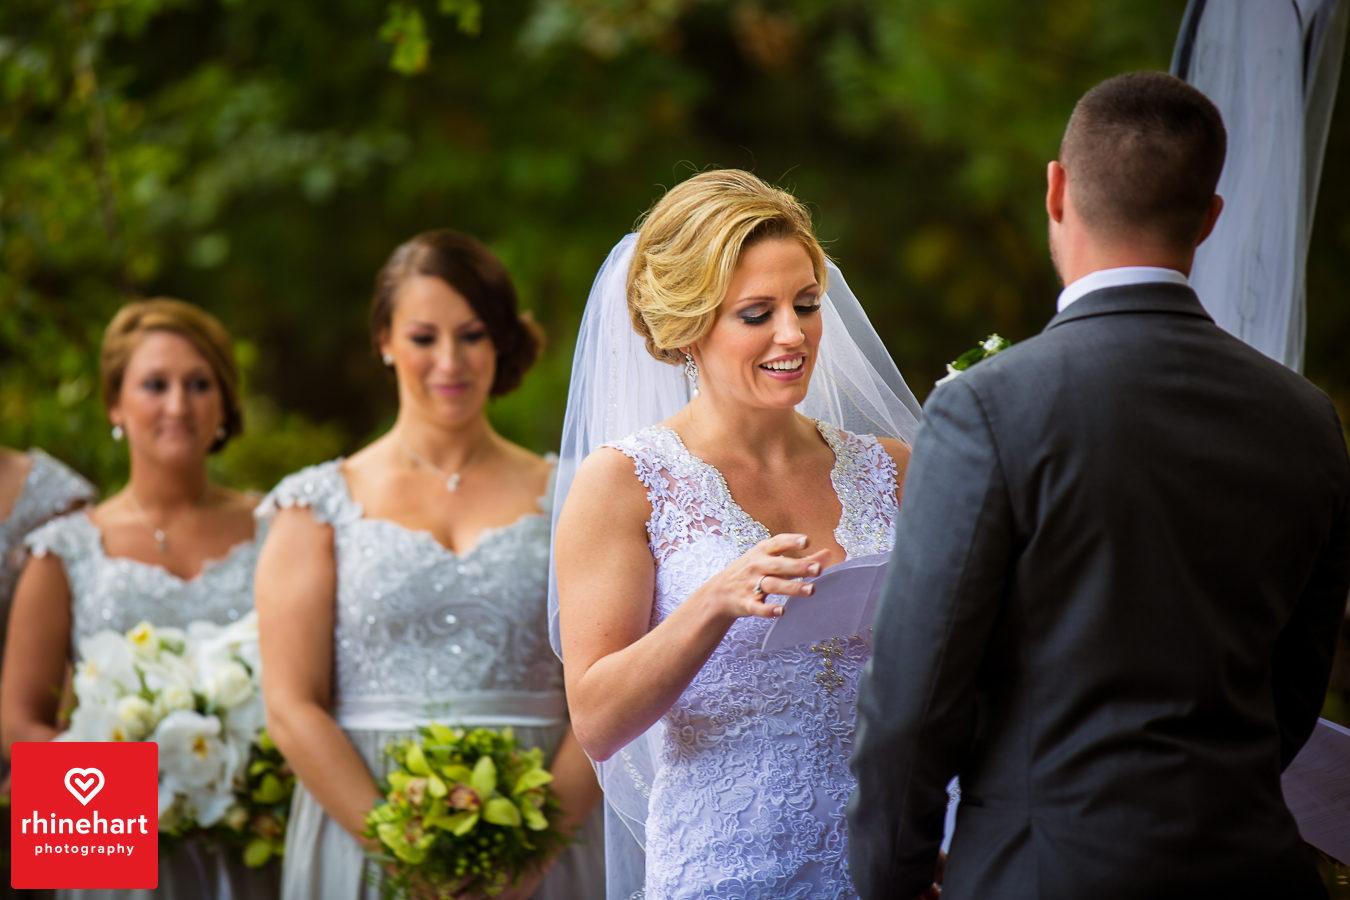 creative-unique-dc-area-wedding-photographers-13